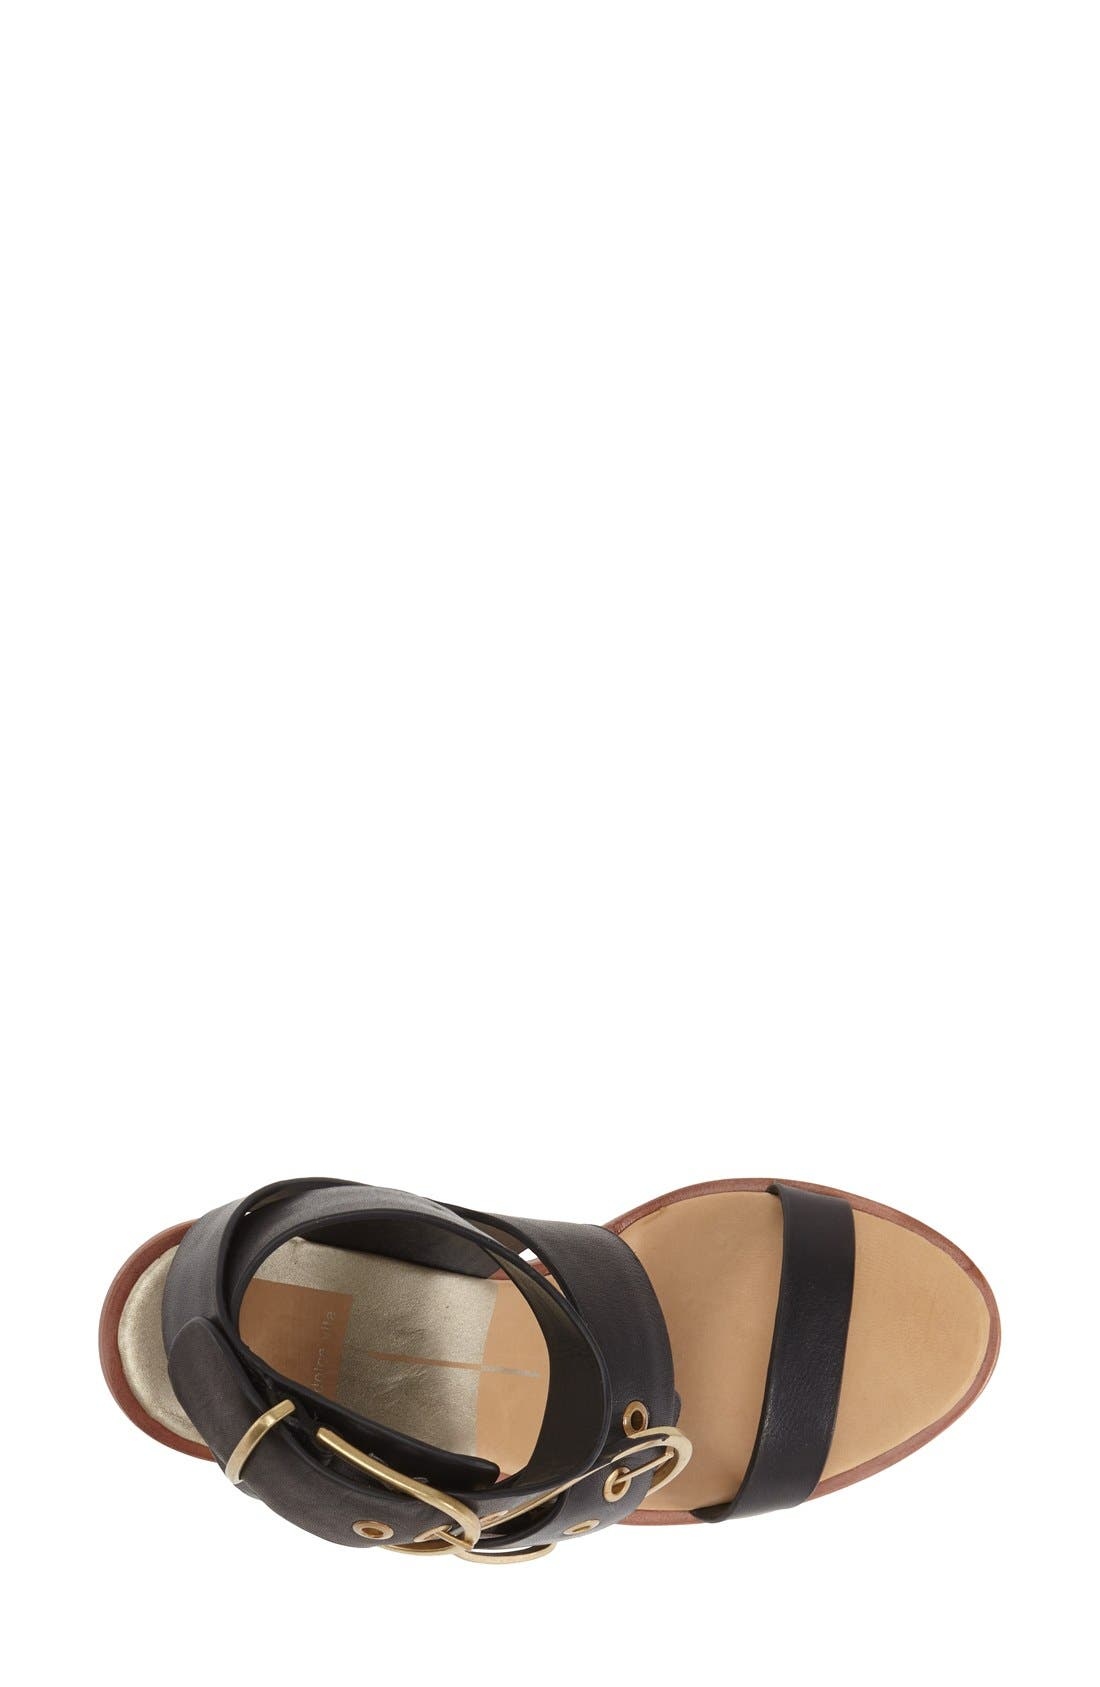 'Julissa' Wedge Sandal,                             Alternate thumbnail 3, color,                             Black